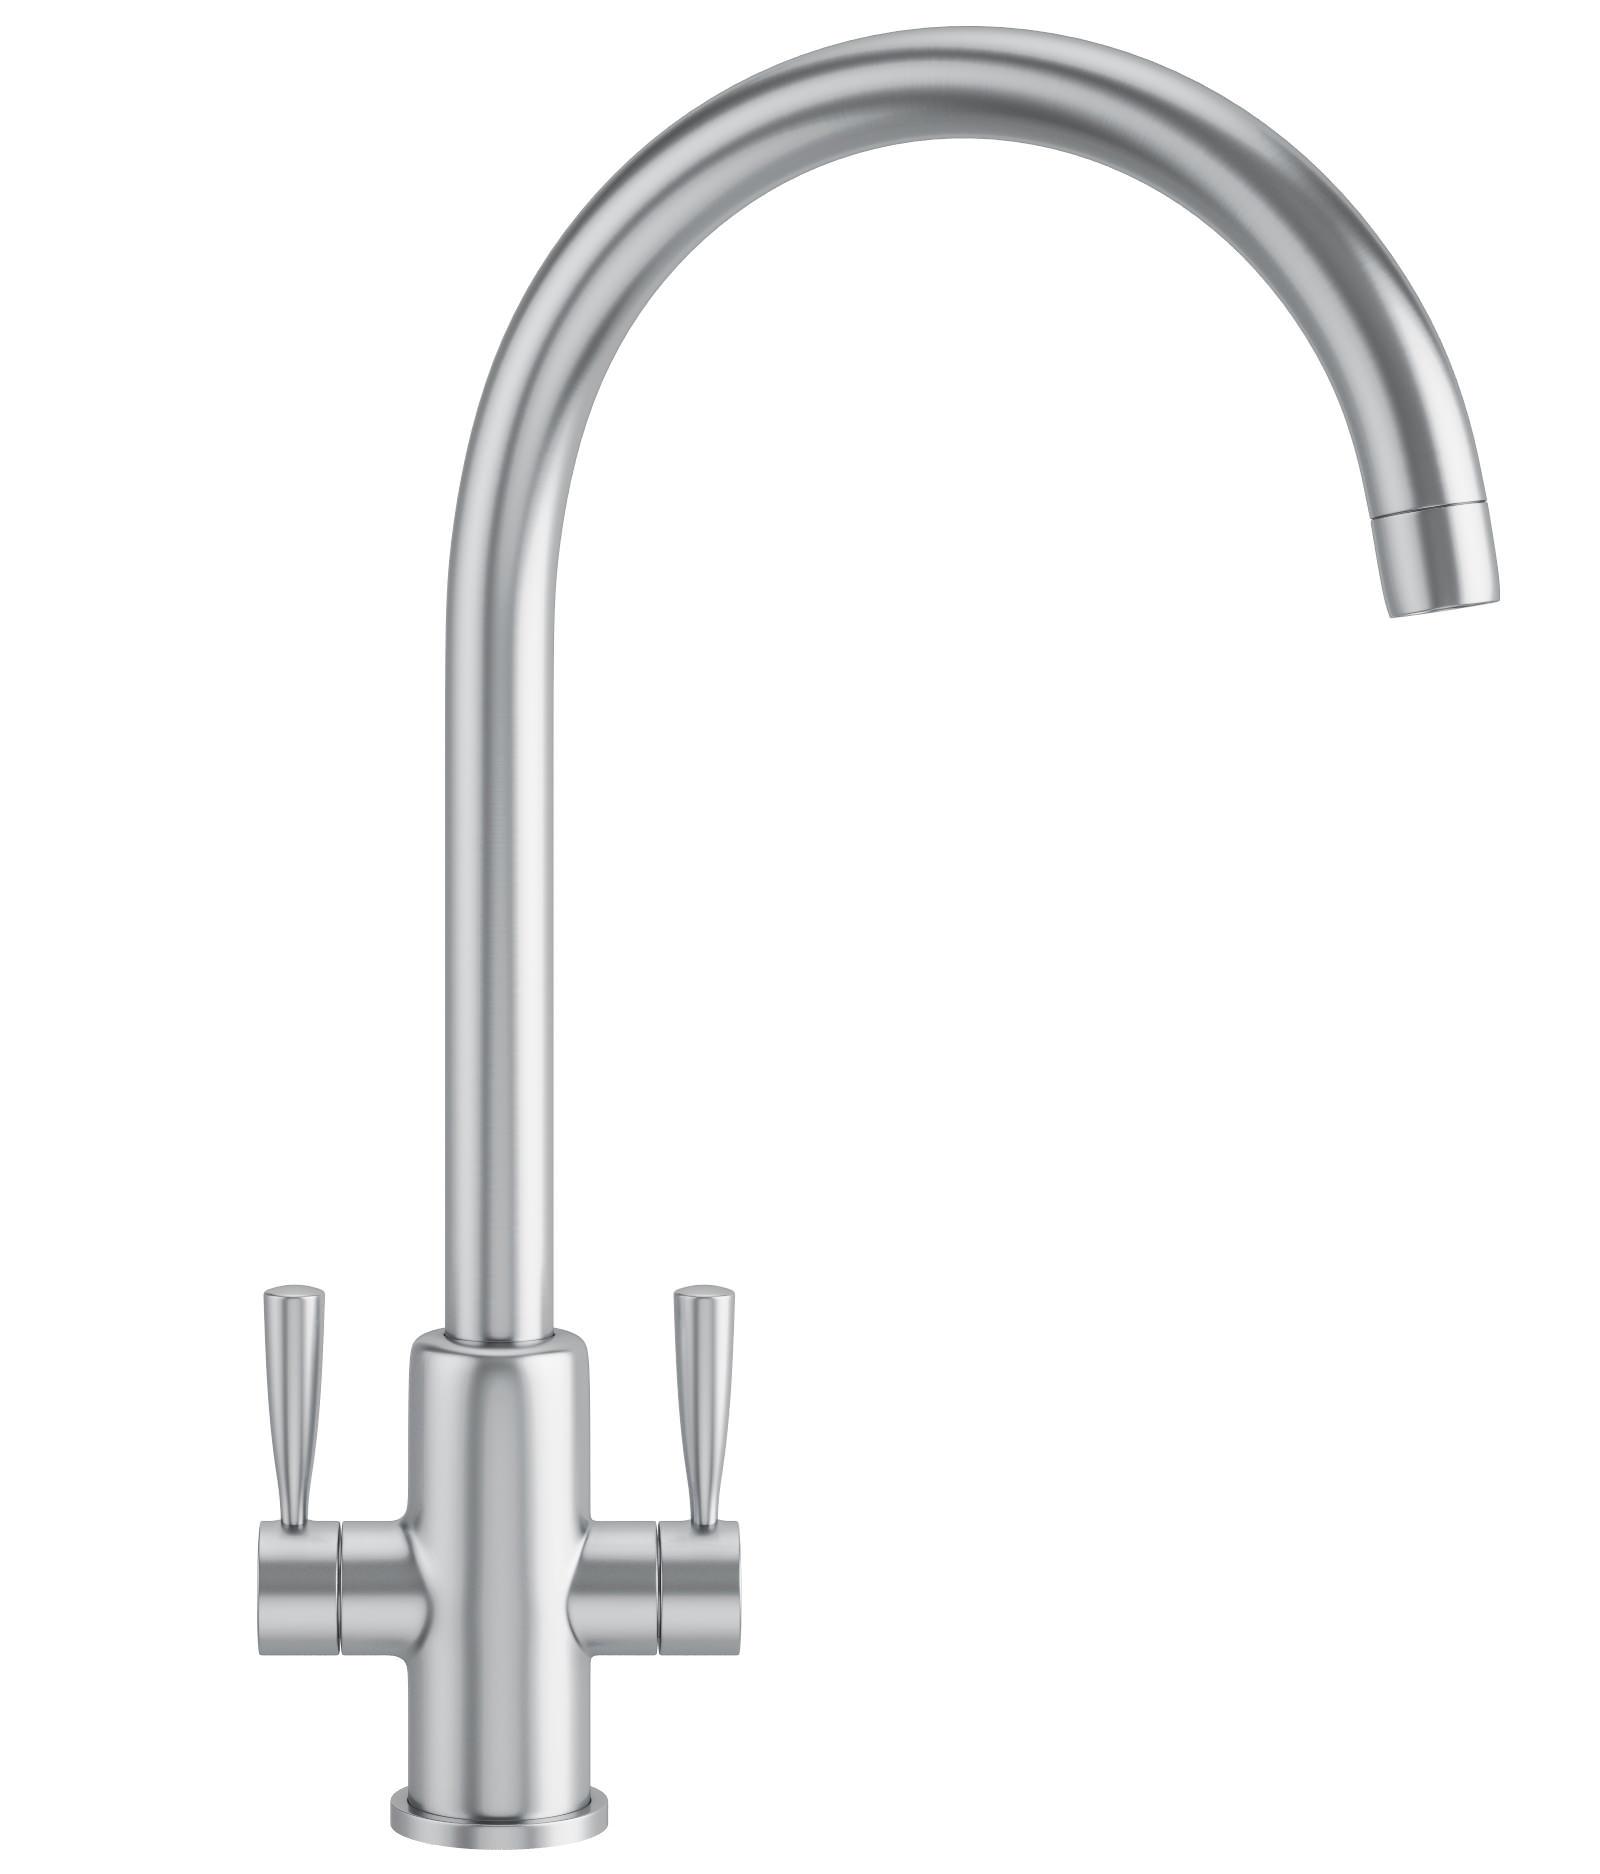 Franke Ascona Kitchen Sink Mixer Tap SilkSteel 1150250636